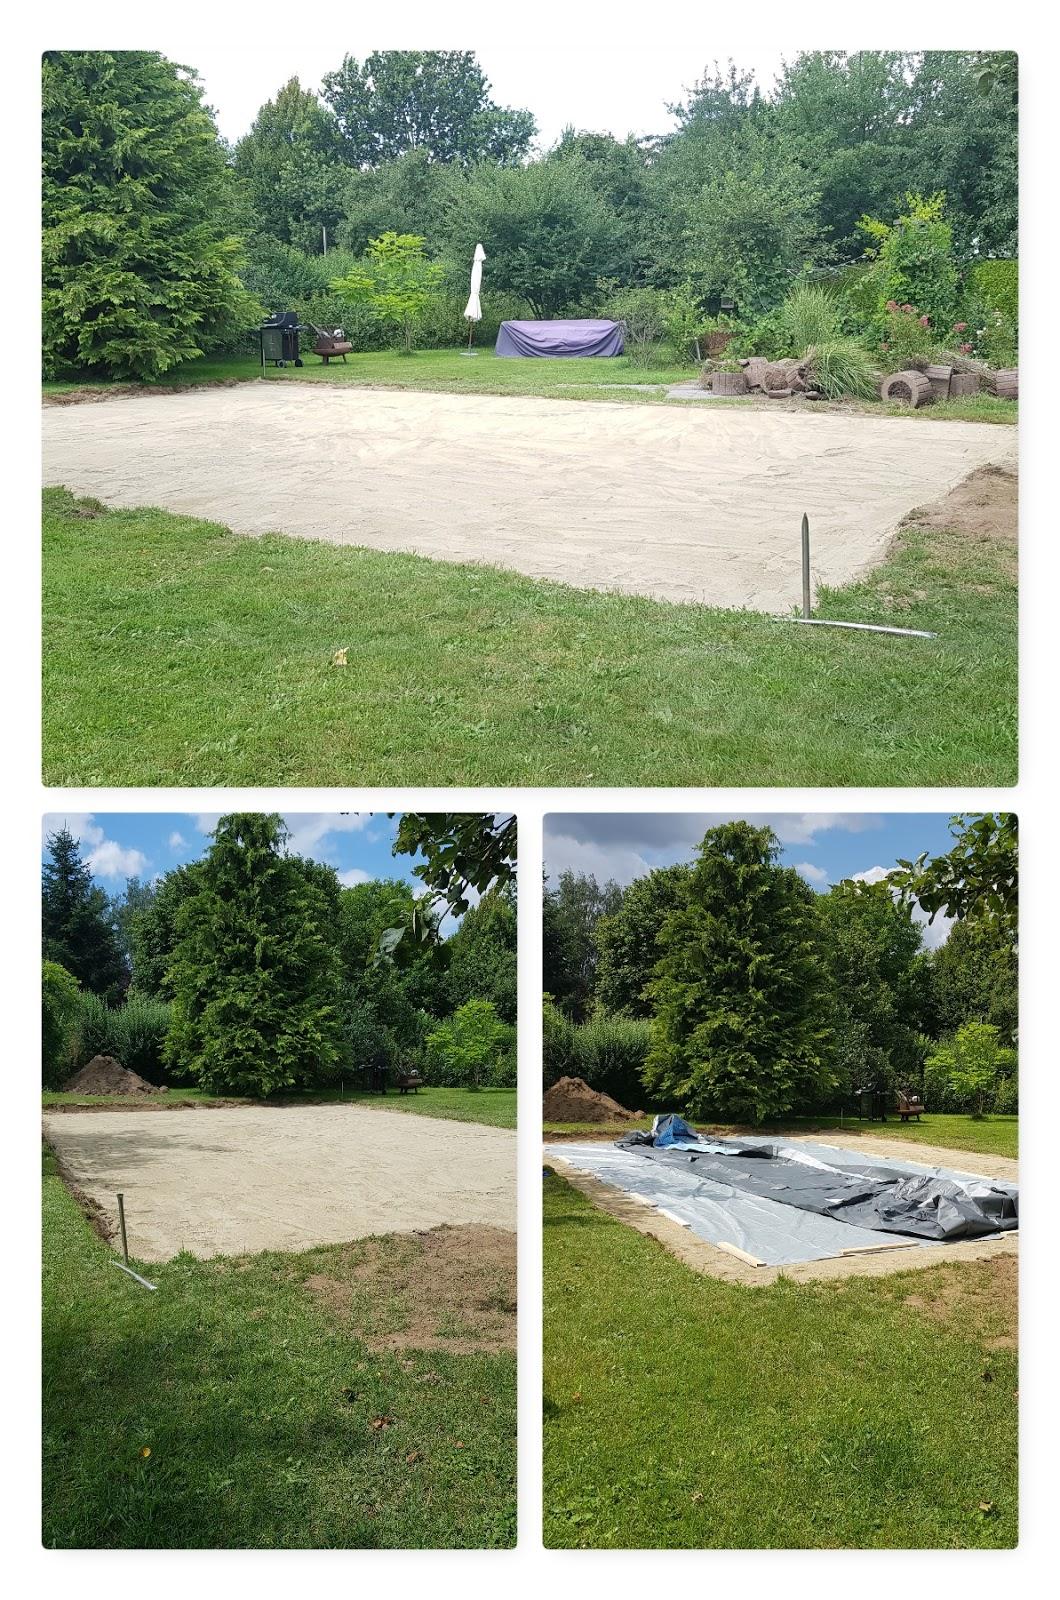 Swimmingpool Aufbau Intex Frame Pool Set Ultra Quadra selberbauen Pool Garten Aufbauanleitung Erfahrung